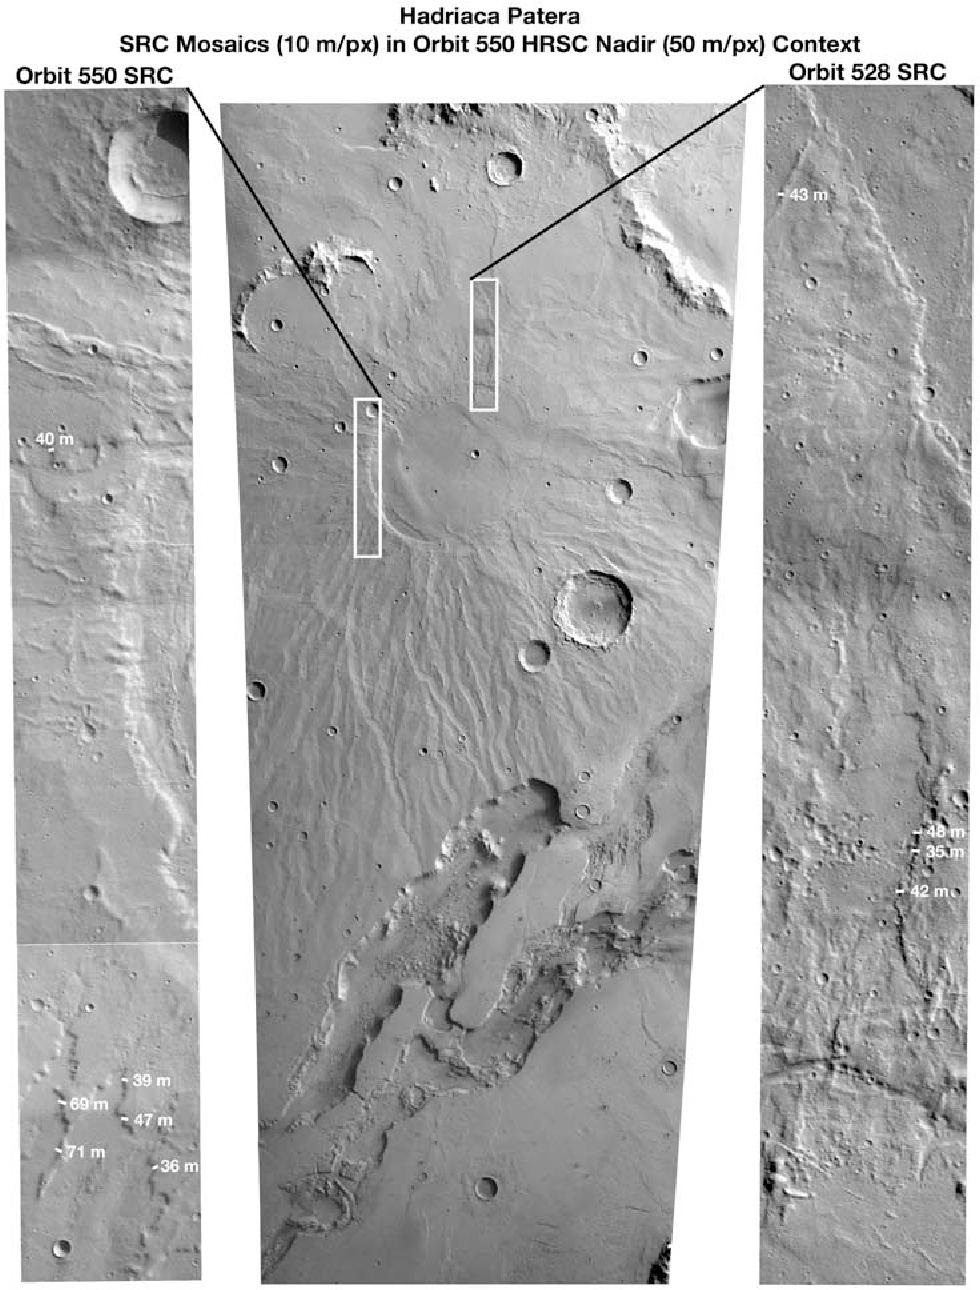 PDF] Hadriaca Patera: Insights into its volcanic history from Mars ...